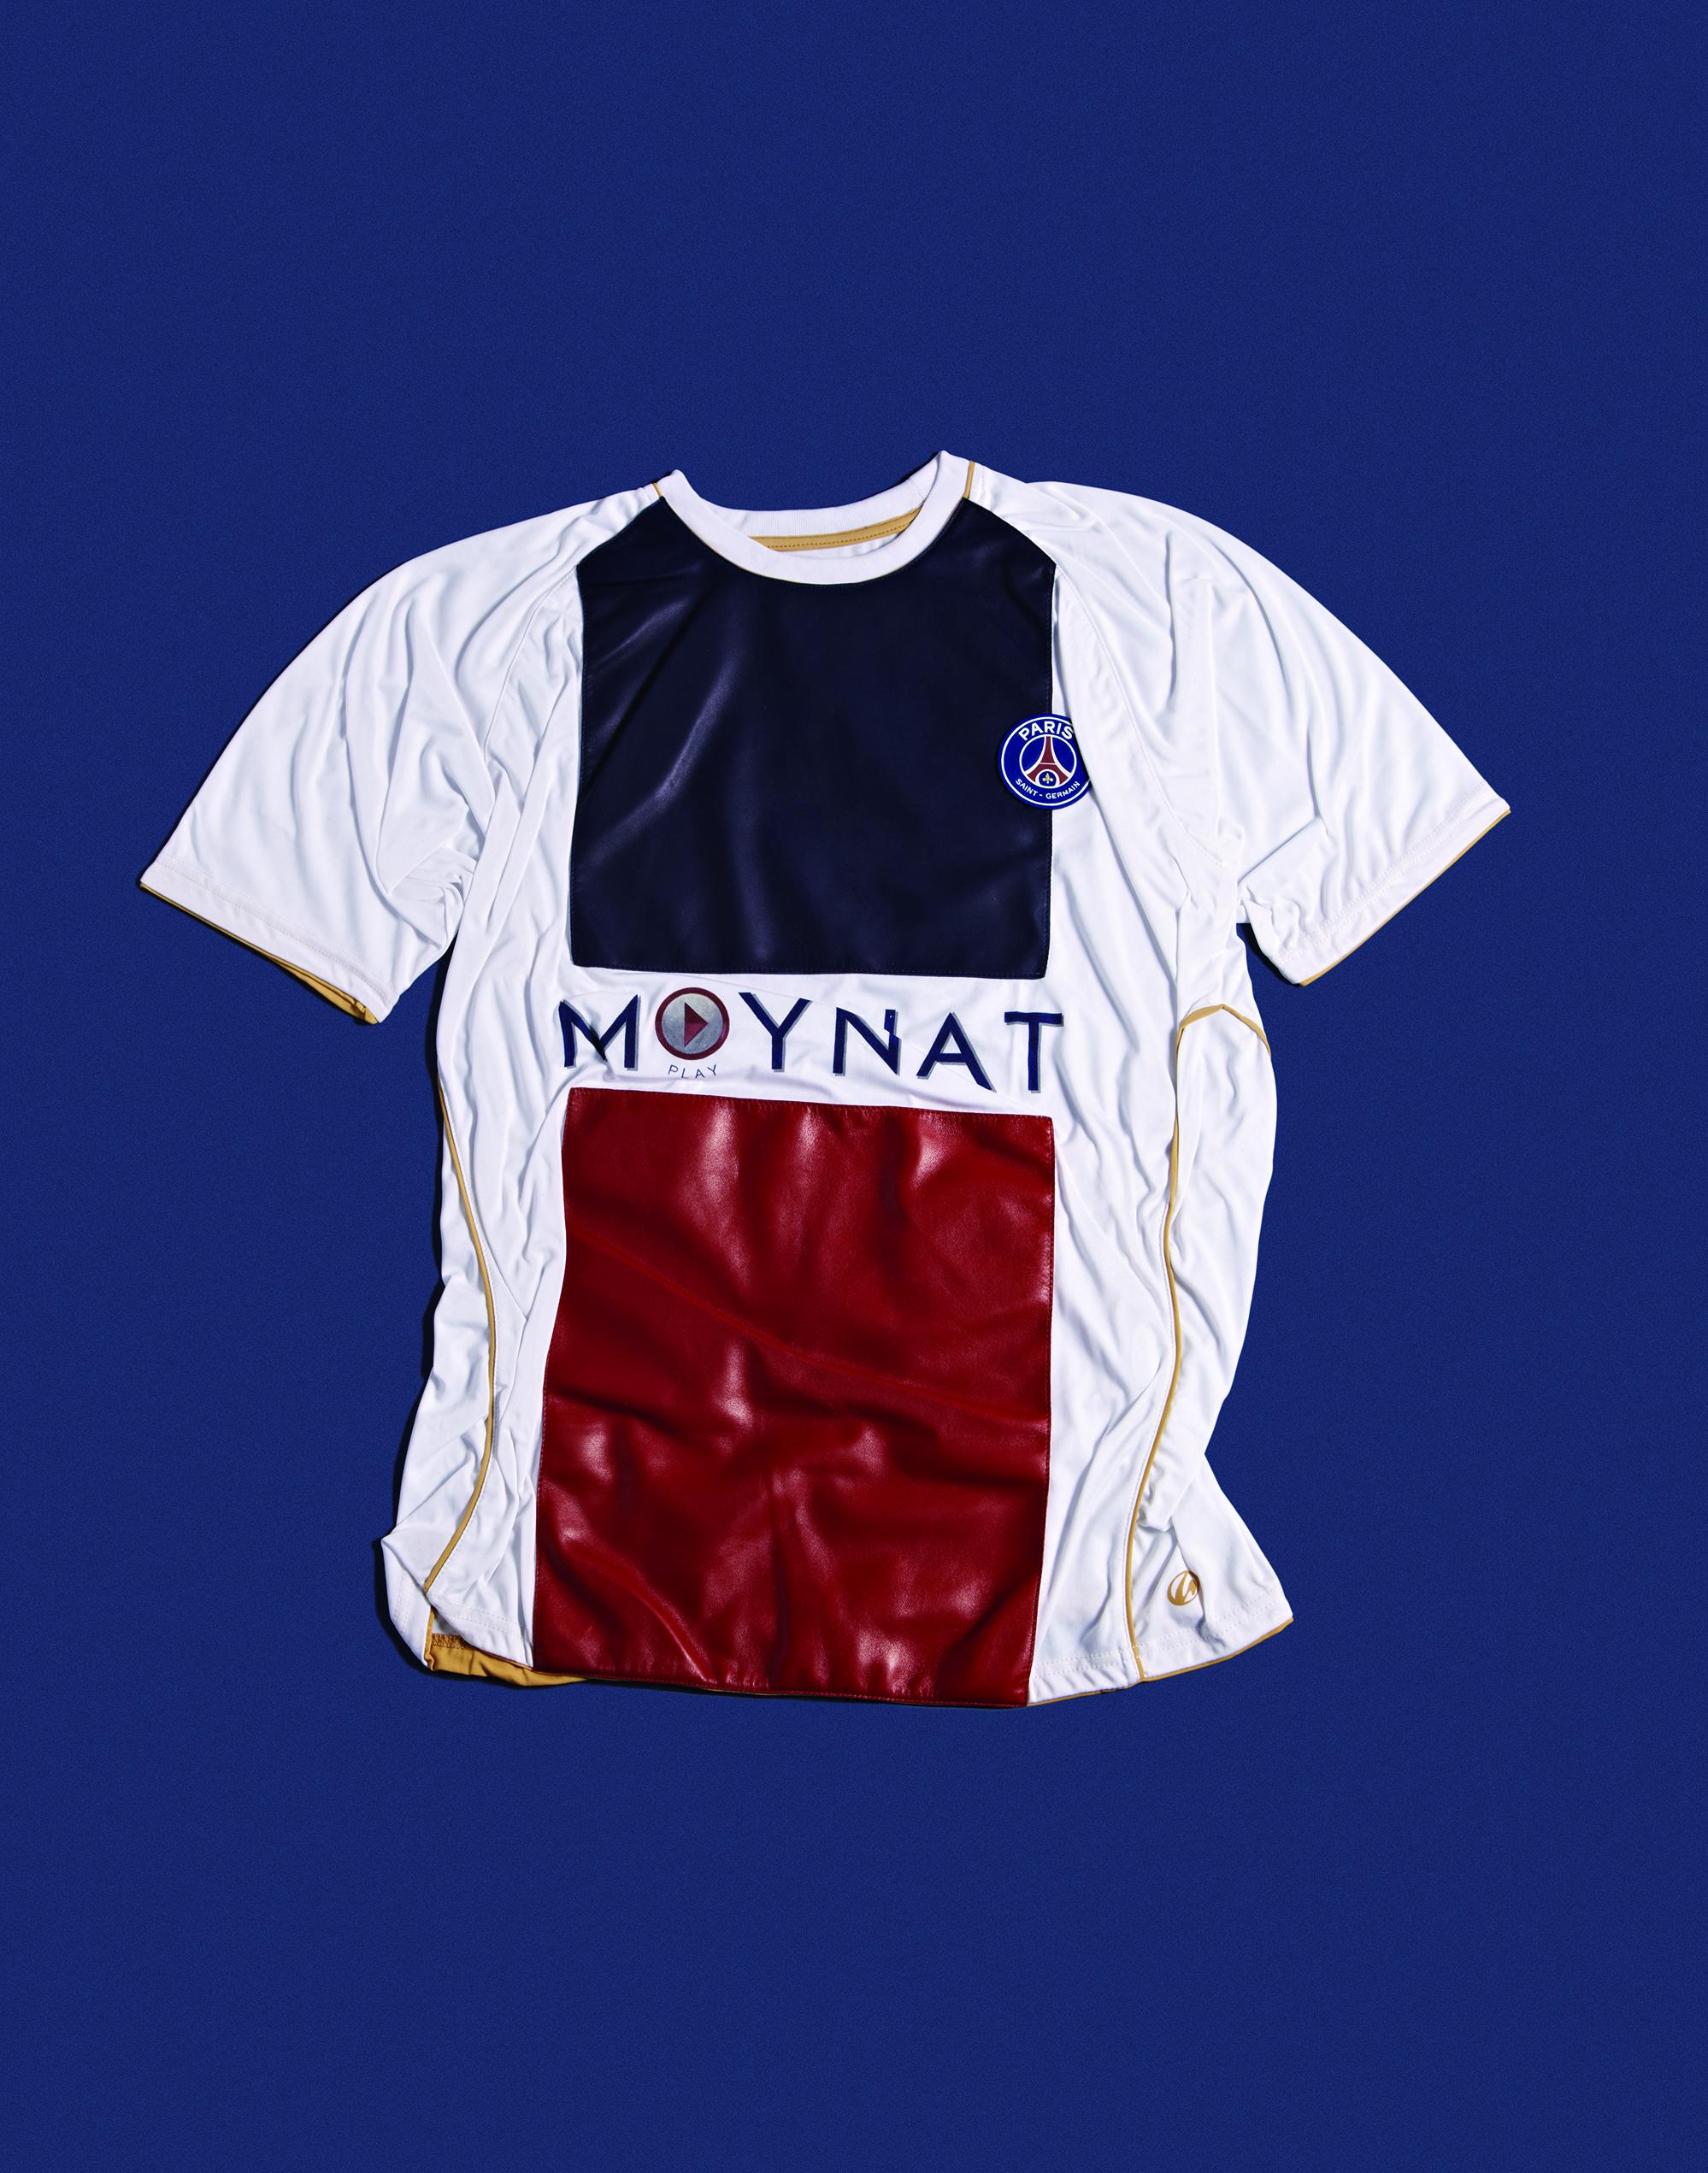 02 moynat